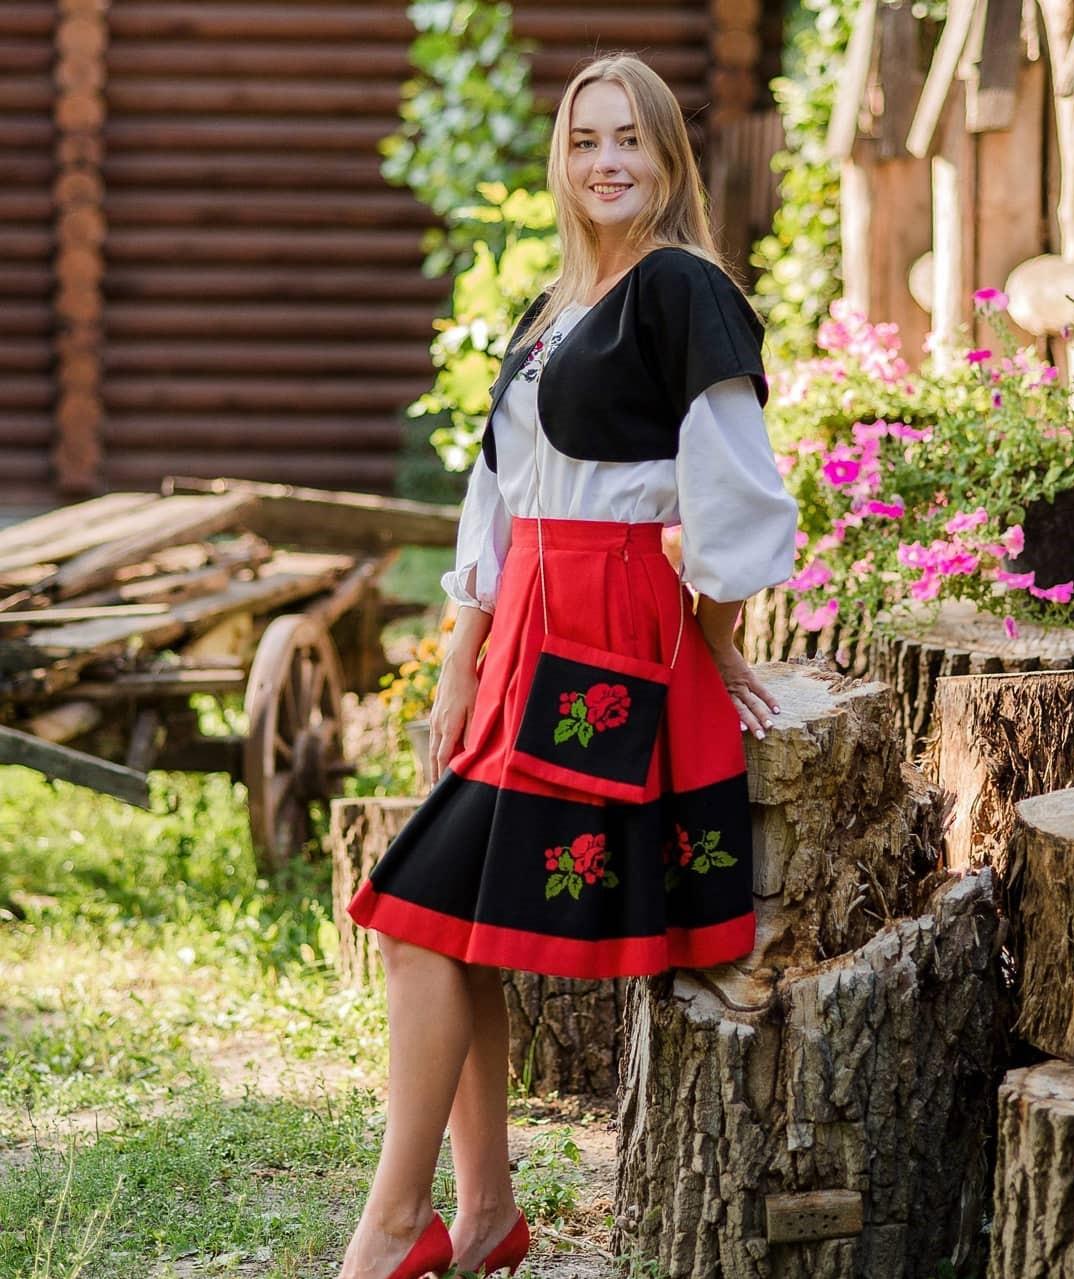 красная юбка + черная блузка фото 2